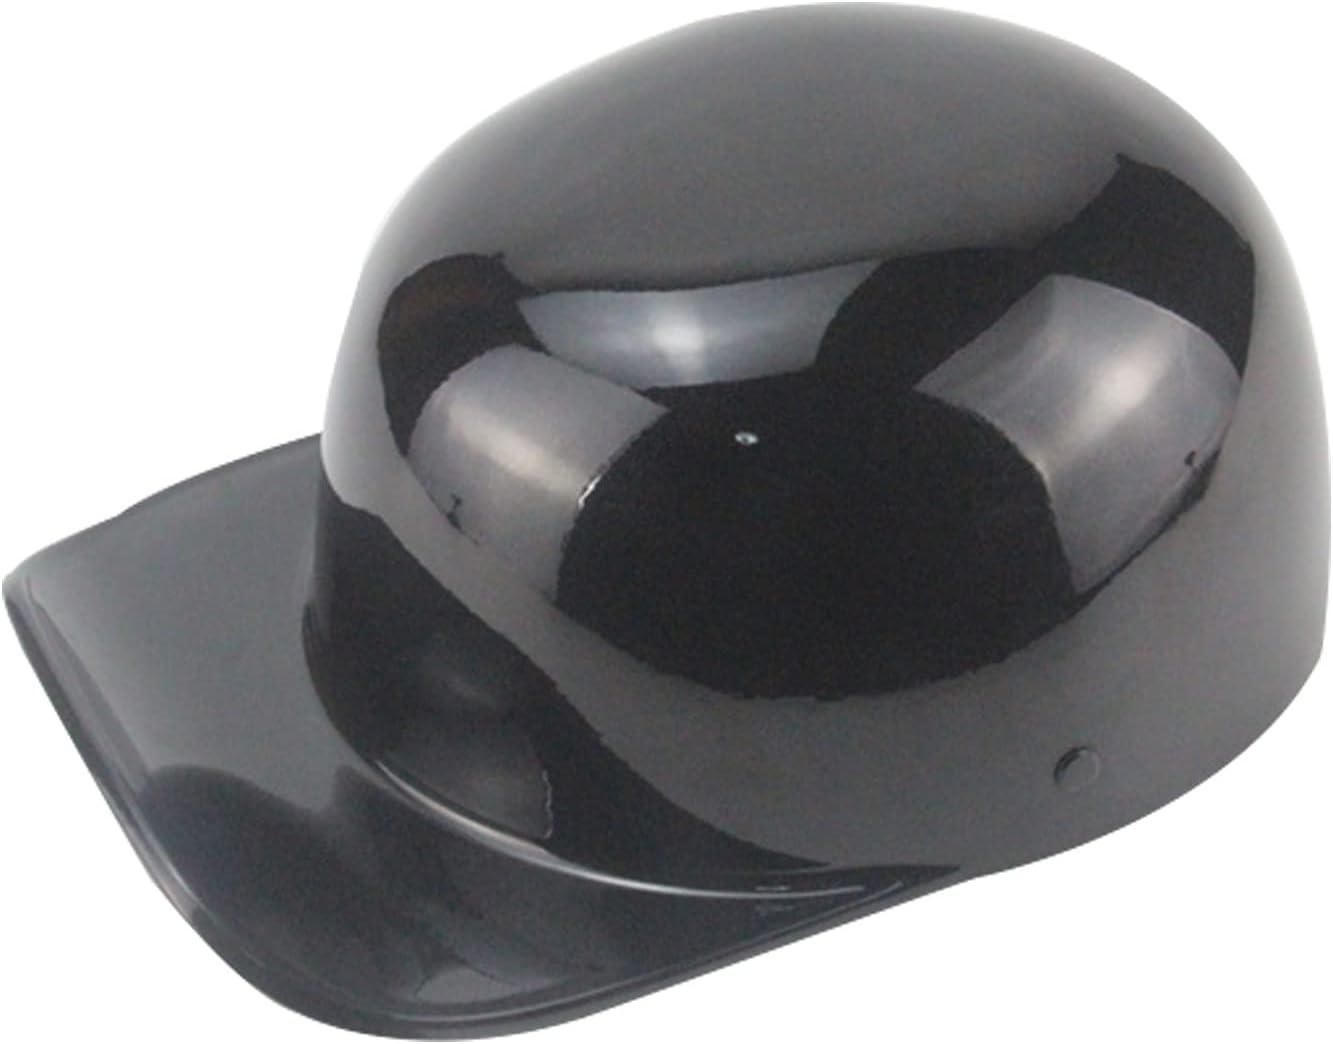 LTJLBHJ Lightweight Skateboard Helmet Helme Cycle Urban Commuter Sale SALE% OFF Luxury goods